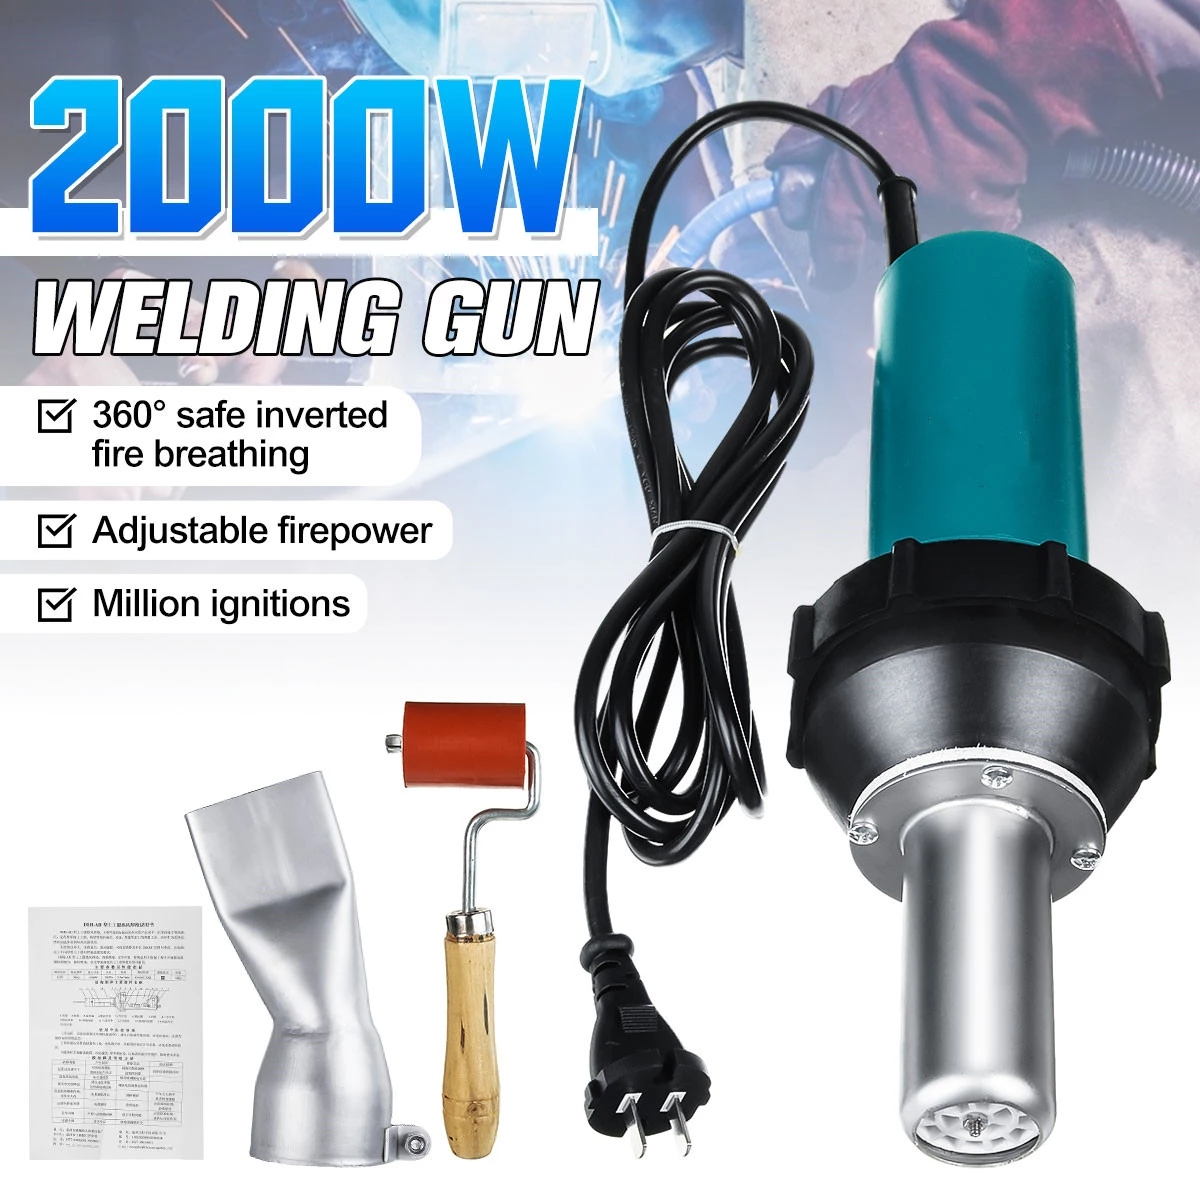 2000W 220V Soldering Welding Torch Hot Air Heat Gun Desoldering Power Tool For Welder + Round / Flat Nose EU Plug